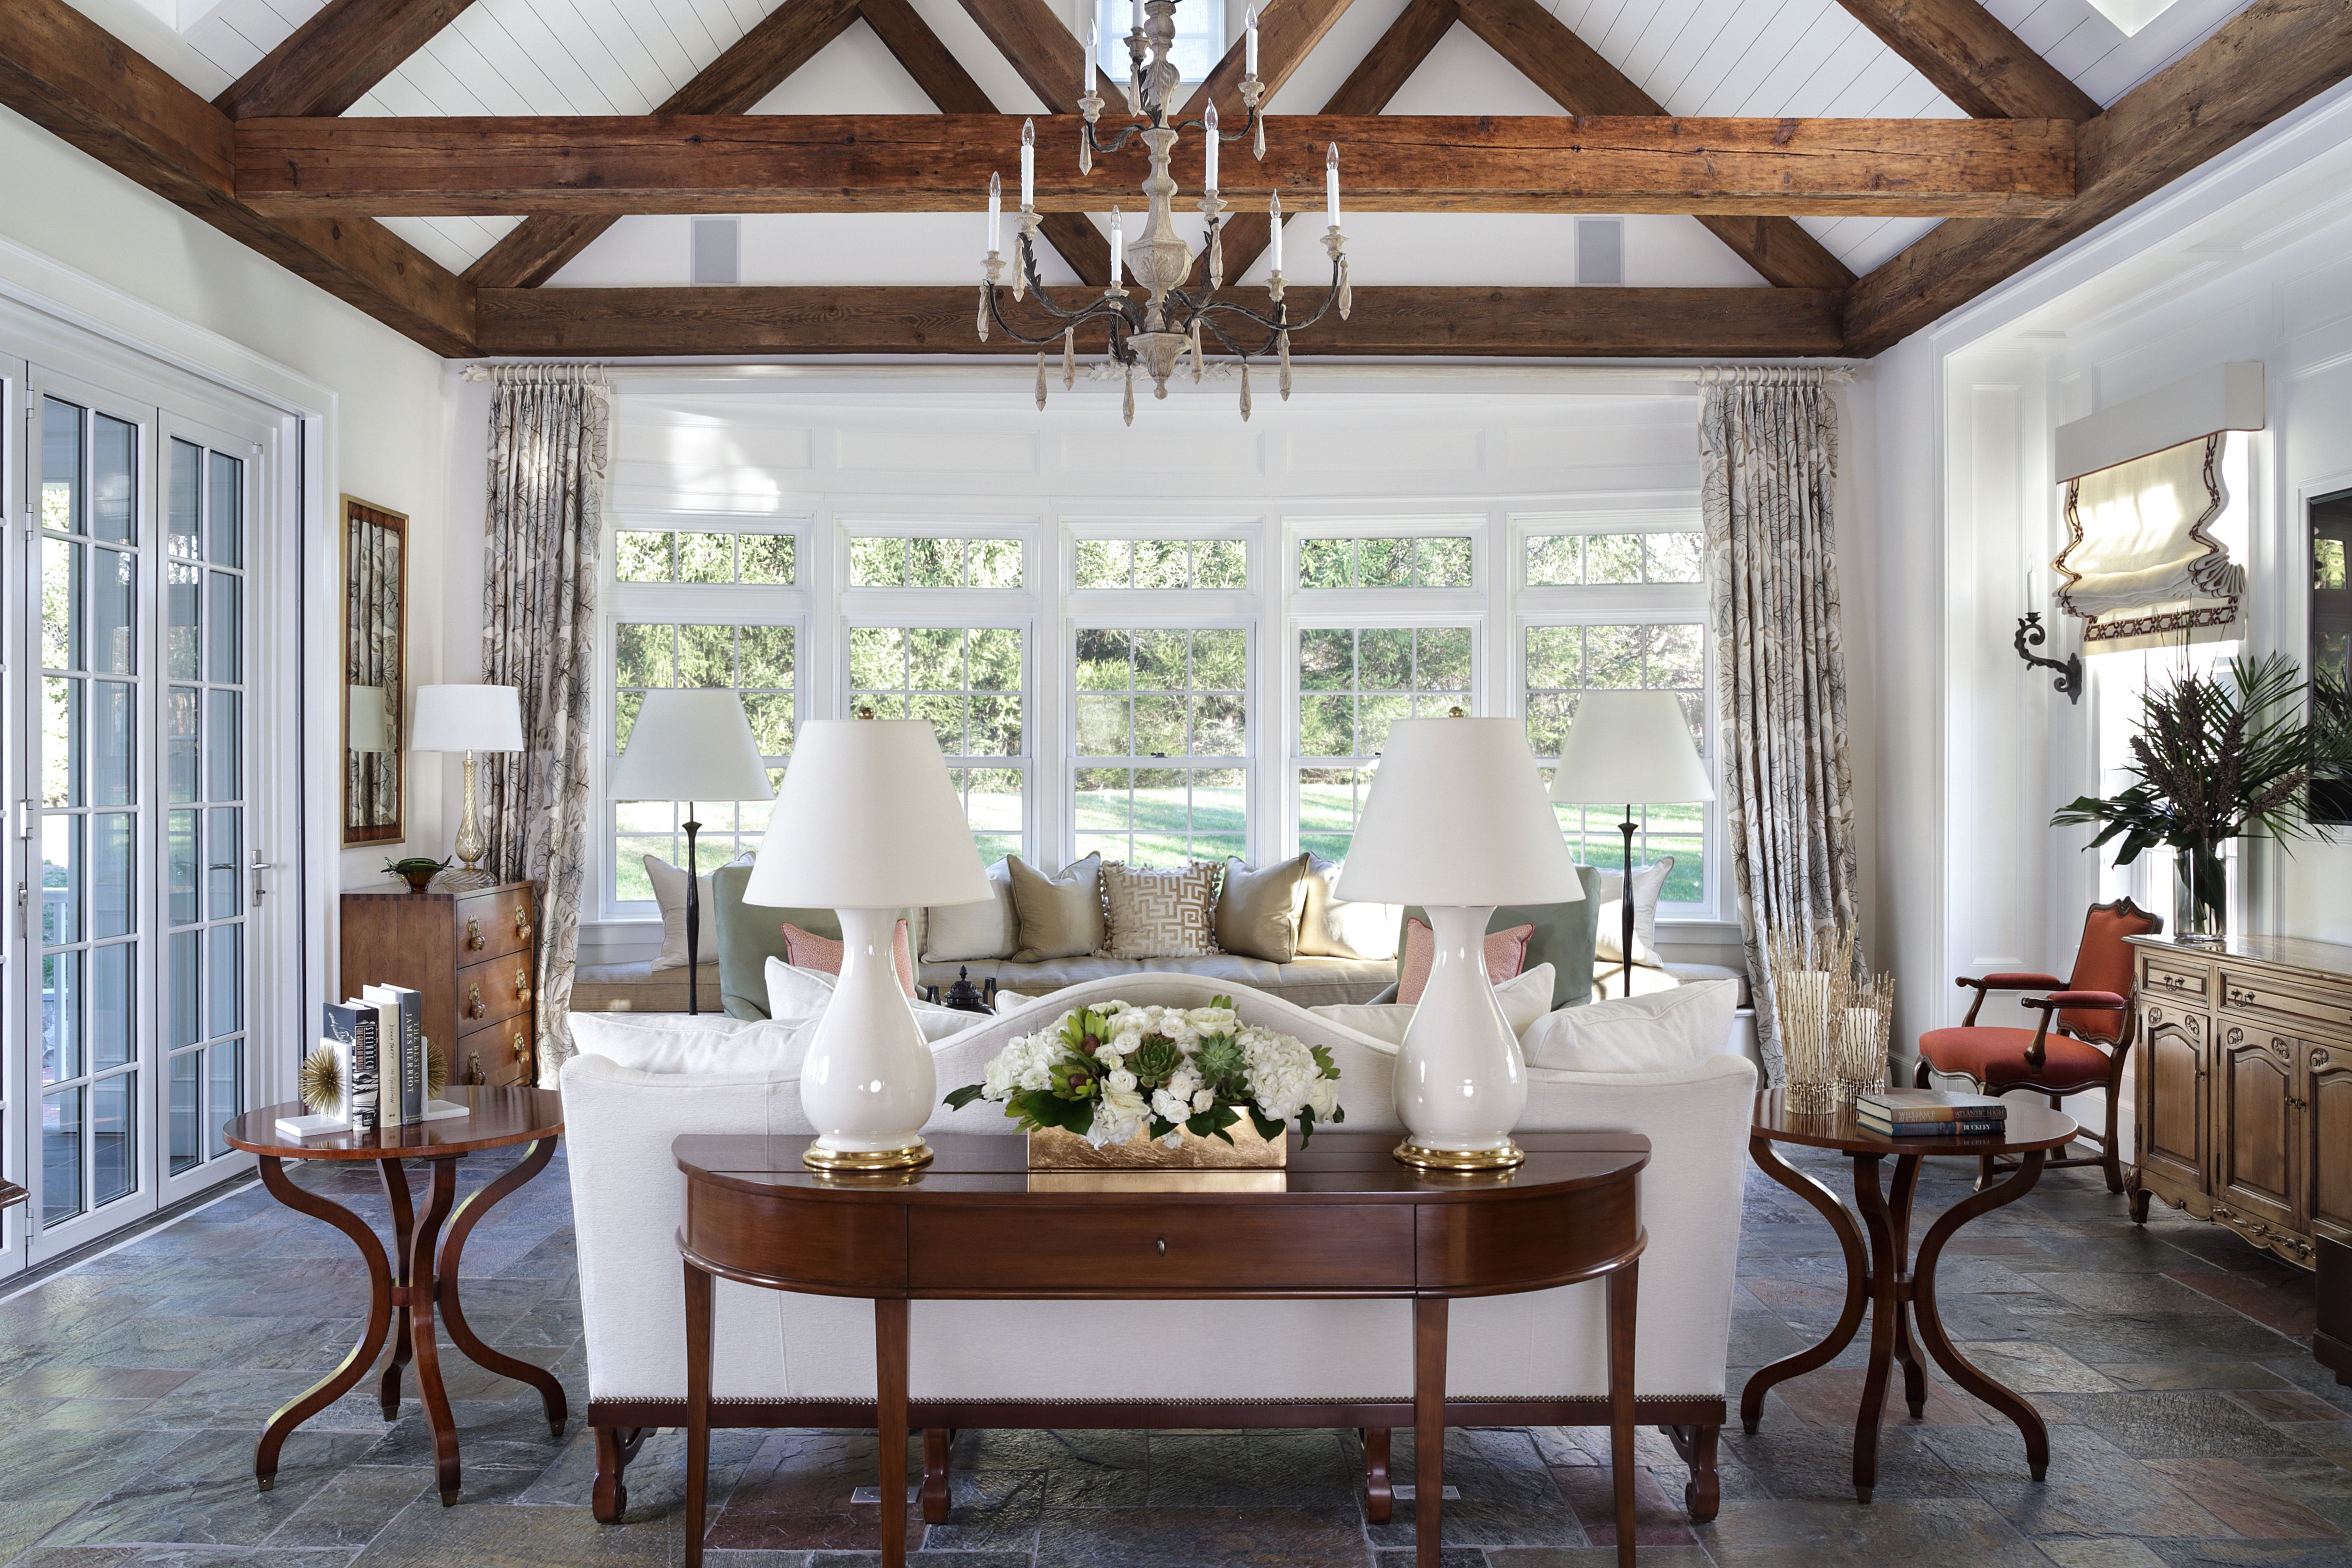 sunroom interiors. Sunroom Claved Slate Floor, Reclaimend Beams.window Seat,nano Door To Dining By J. Stephens Interiors - Lookbook E